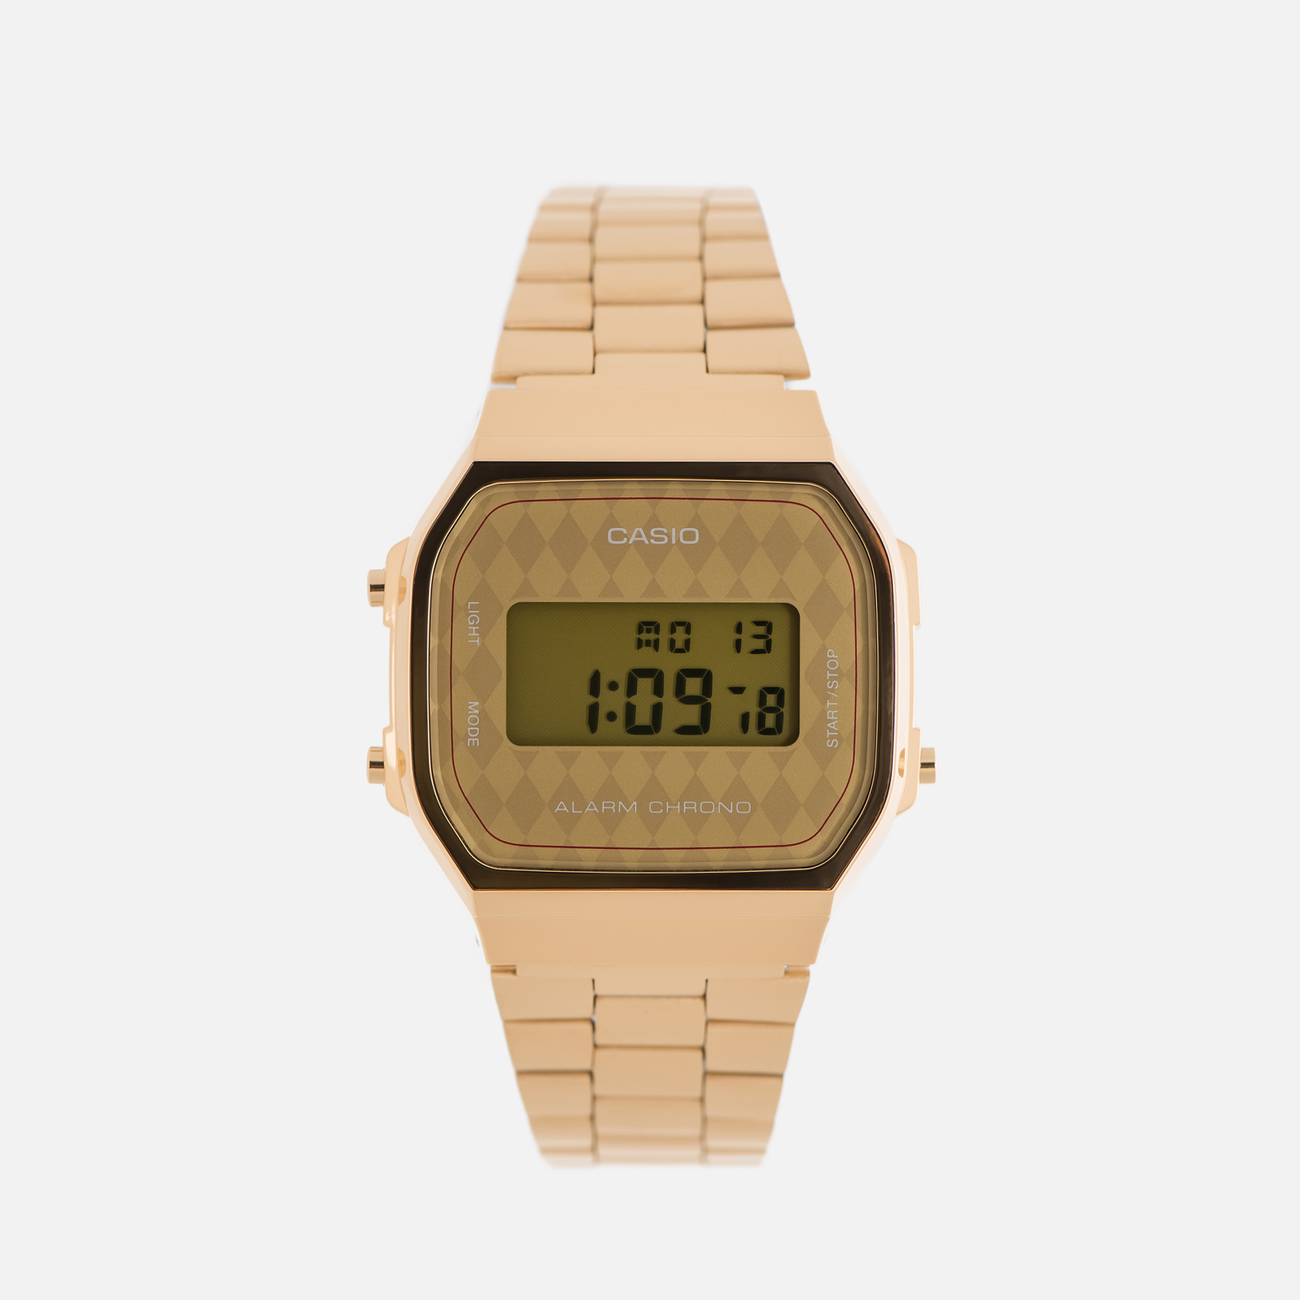 Наручные часы CASIO Collection A-168WG-9B Gold/Rhombus Yellow